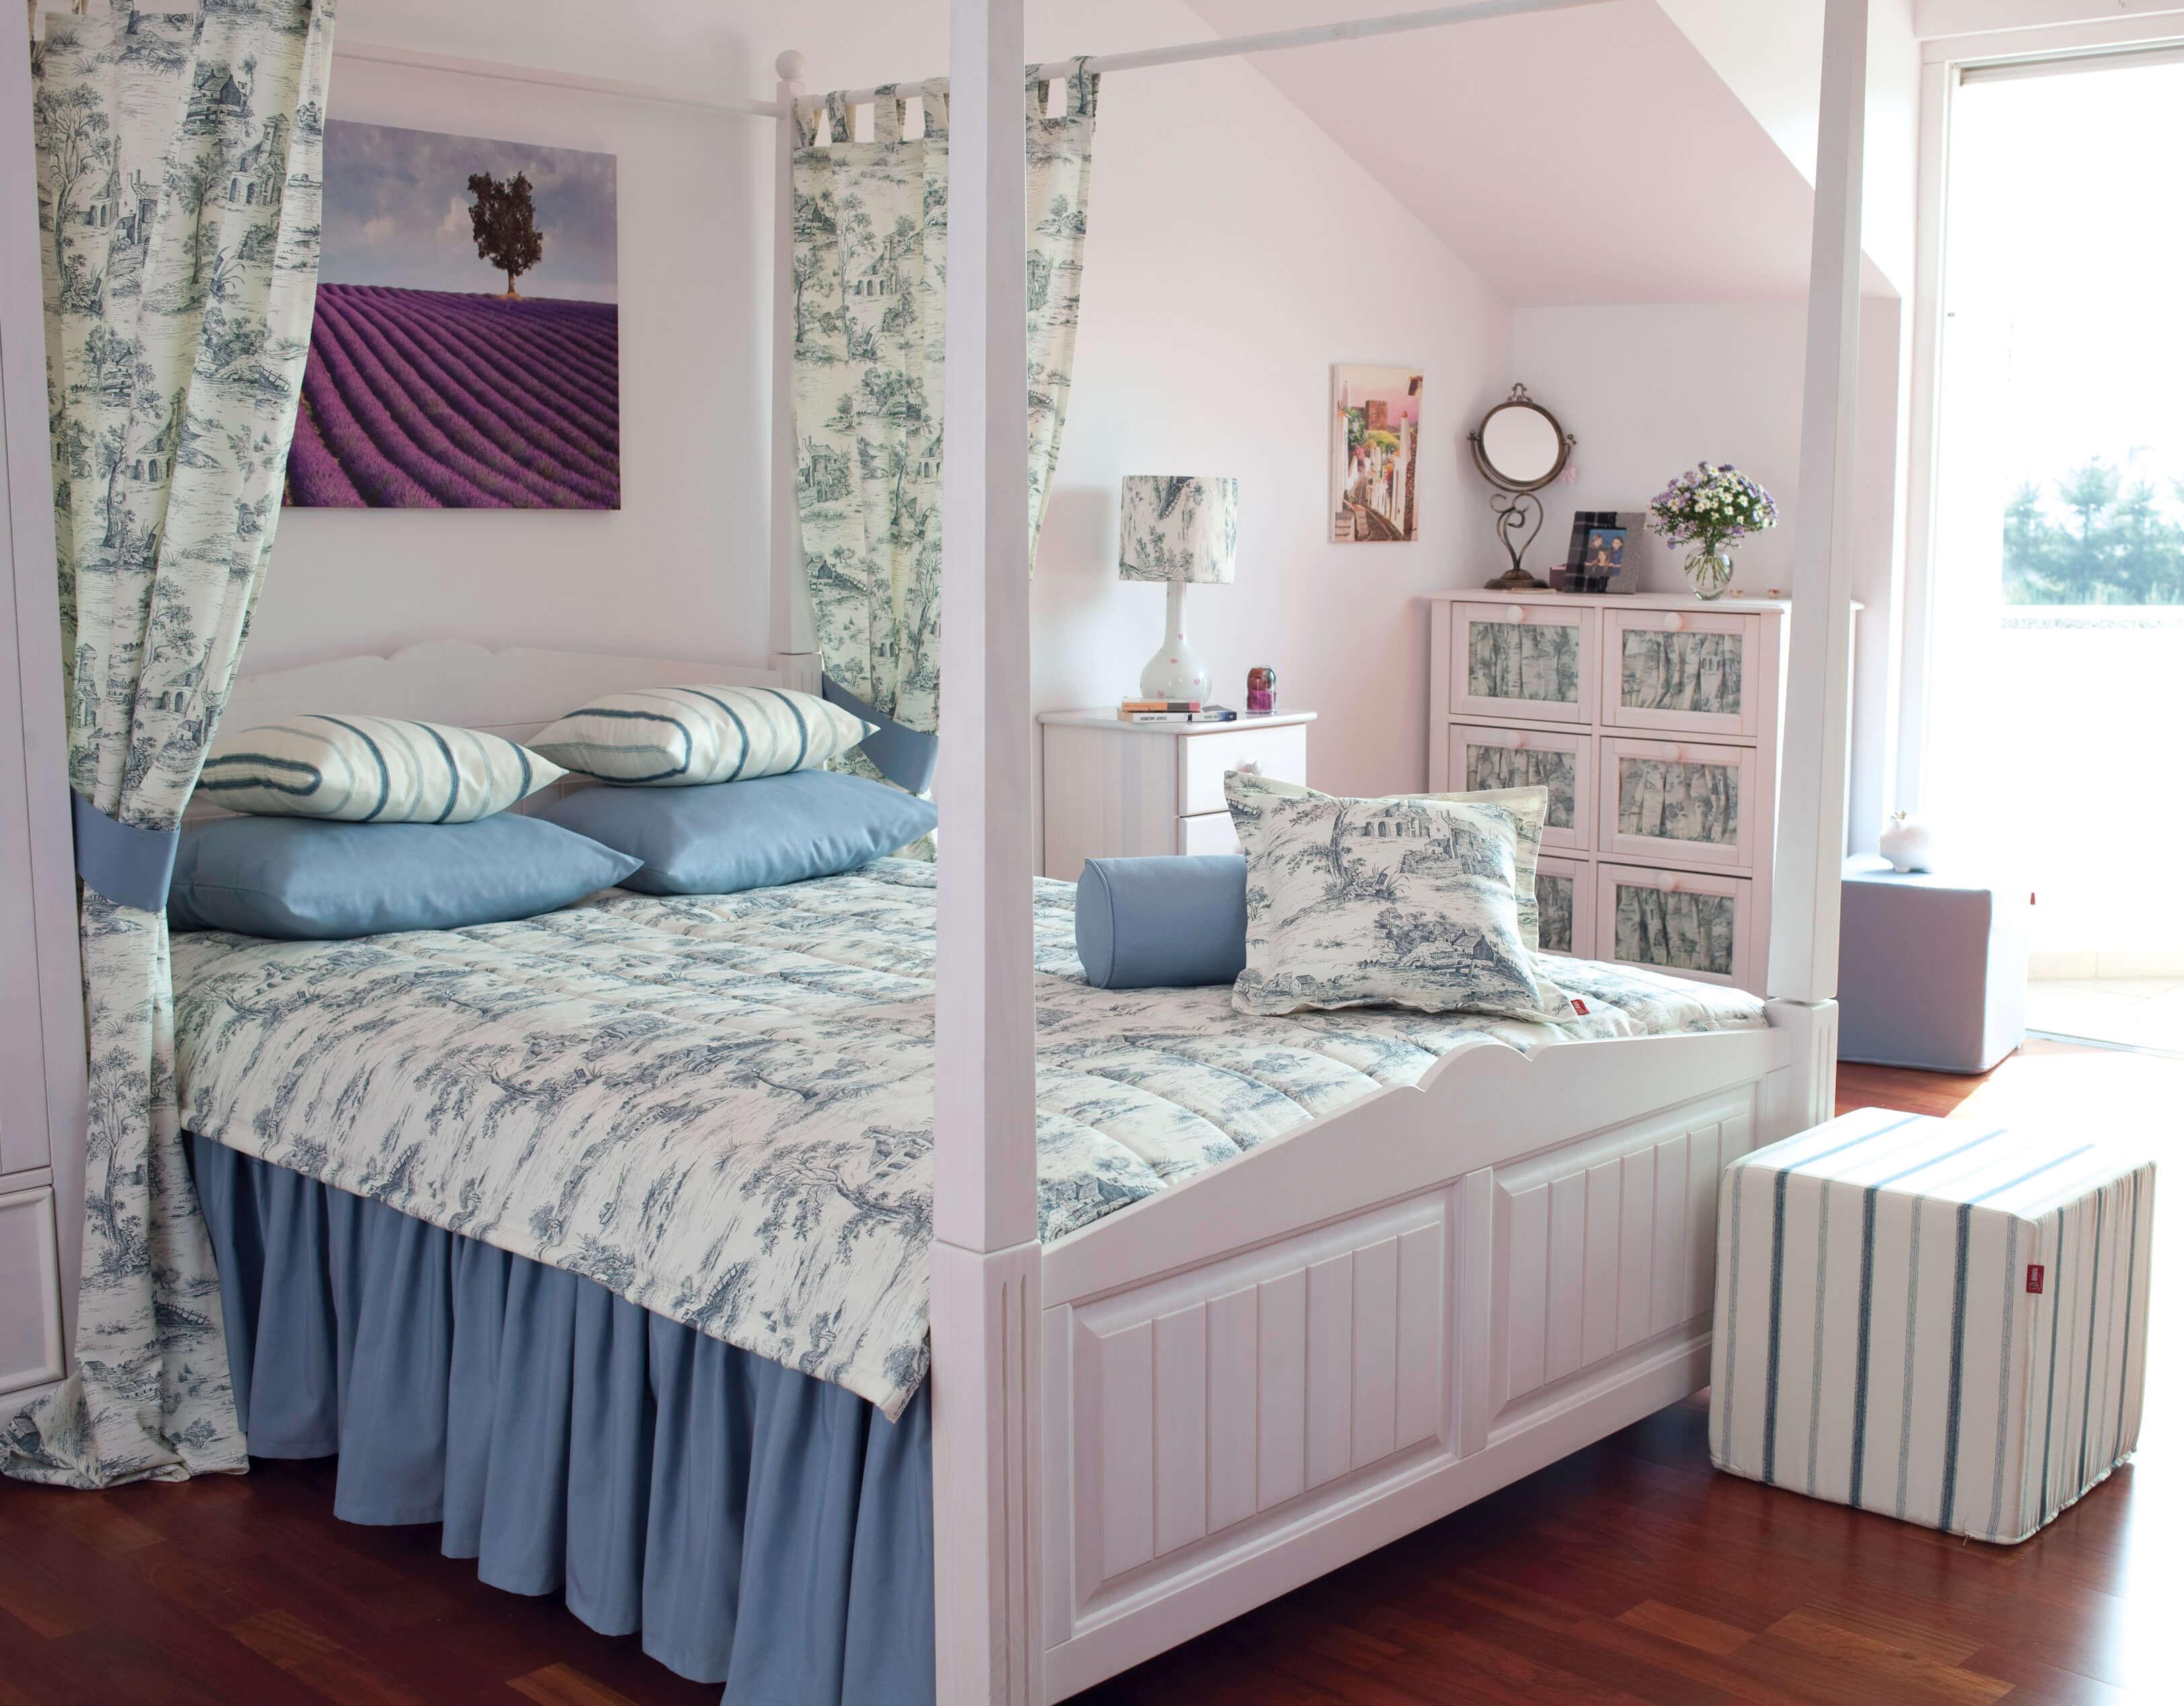 Покрывало для кровати с балдахином